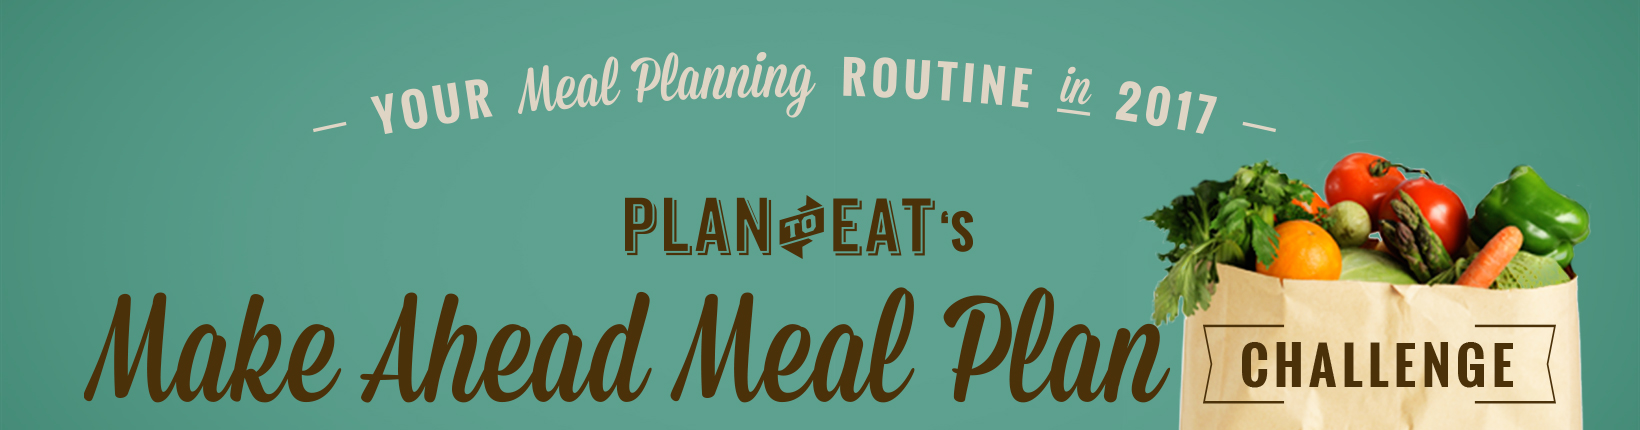 mealplan-challenge-header